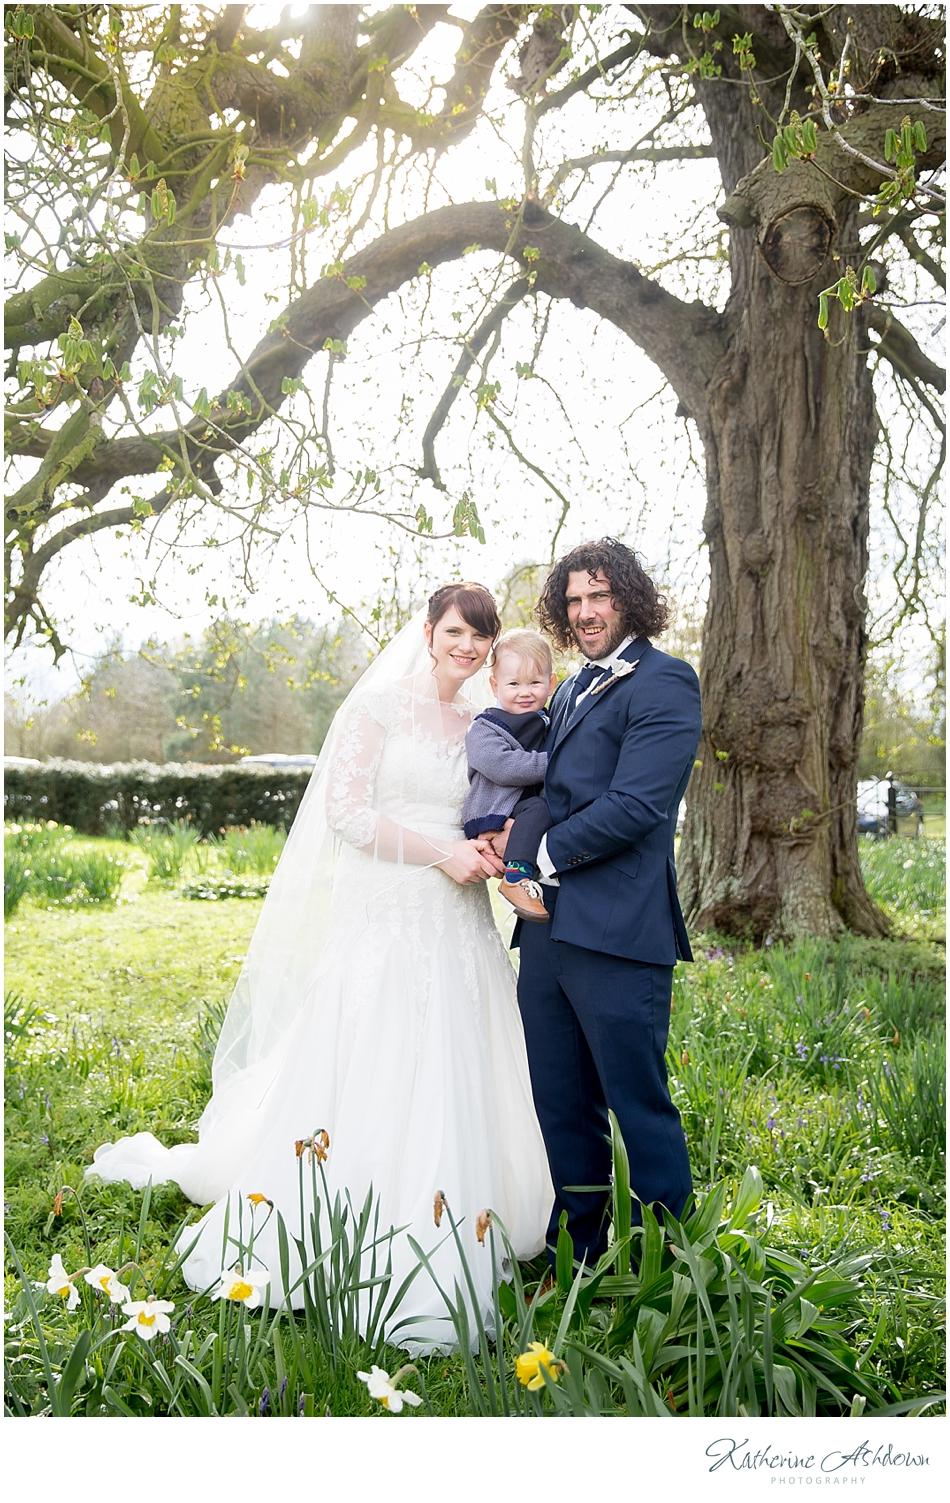 Katherine Ashdown Photography Wedding_037